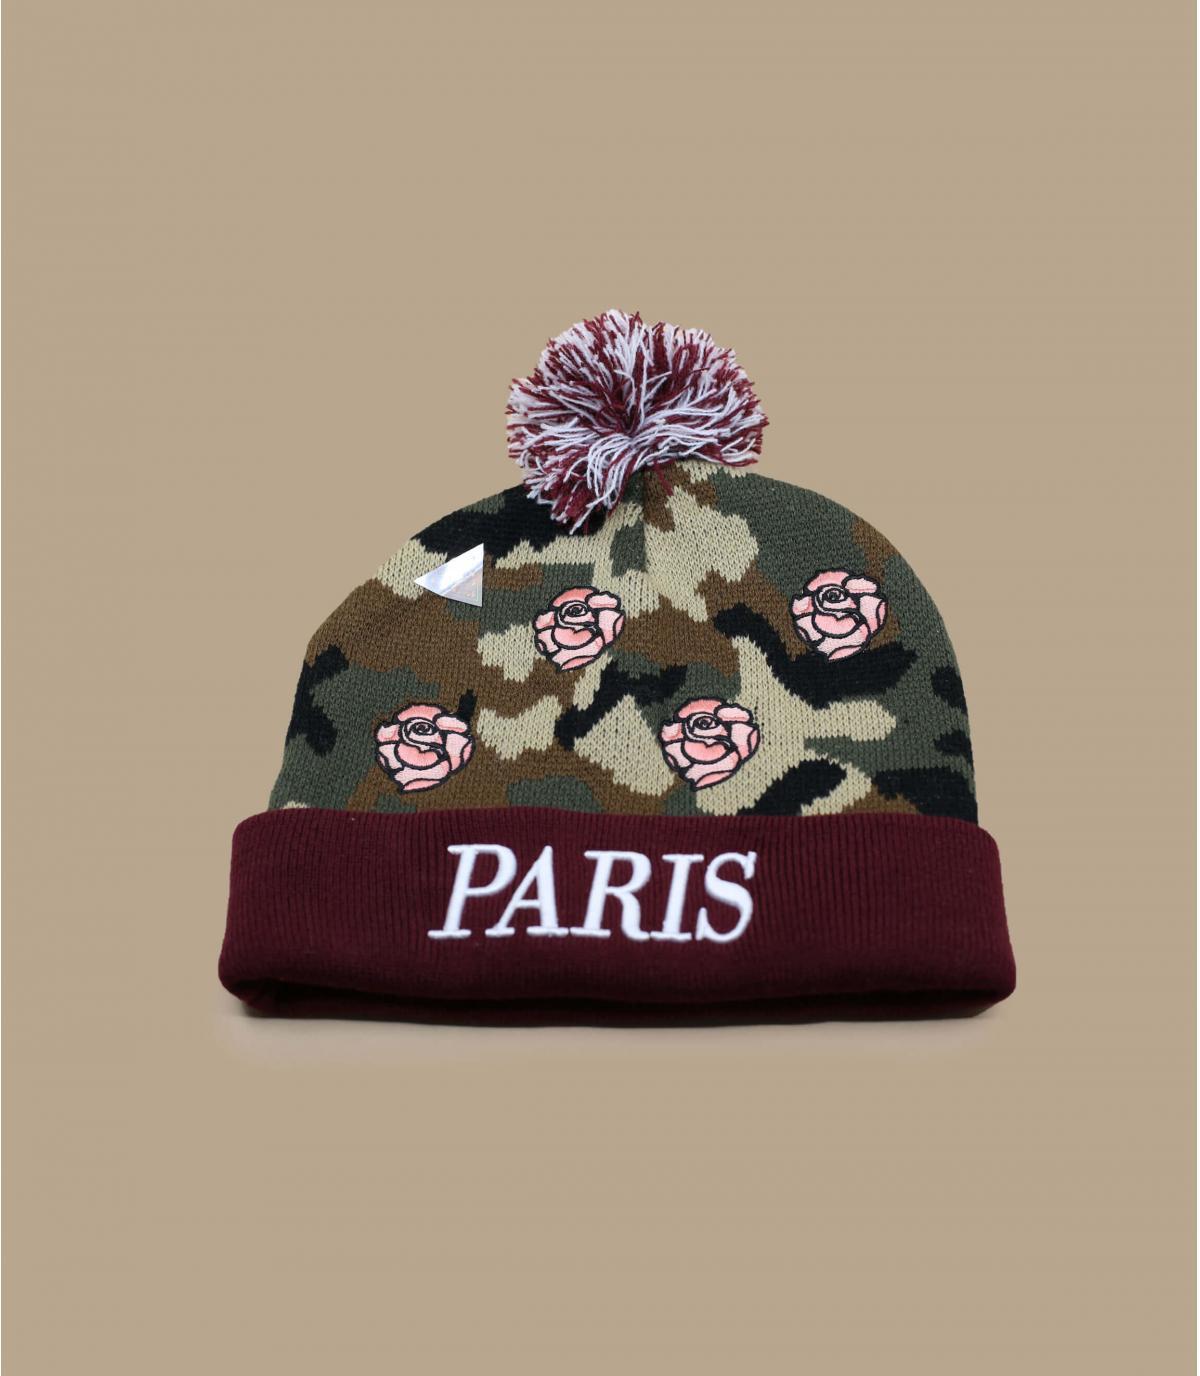 Parisian beanie cayler